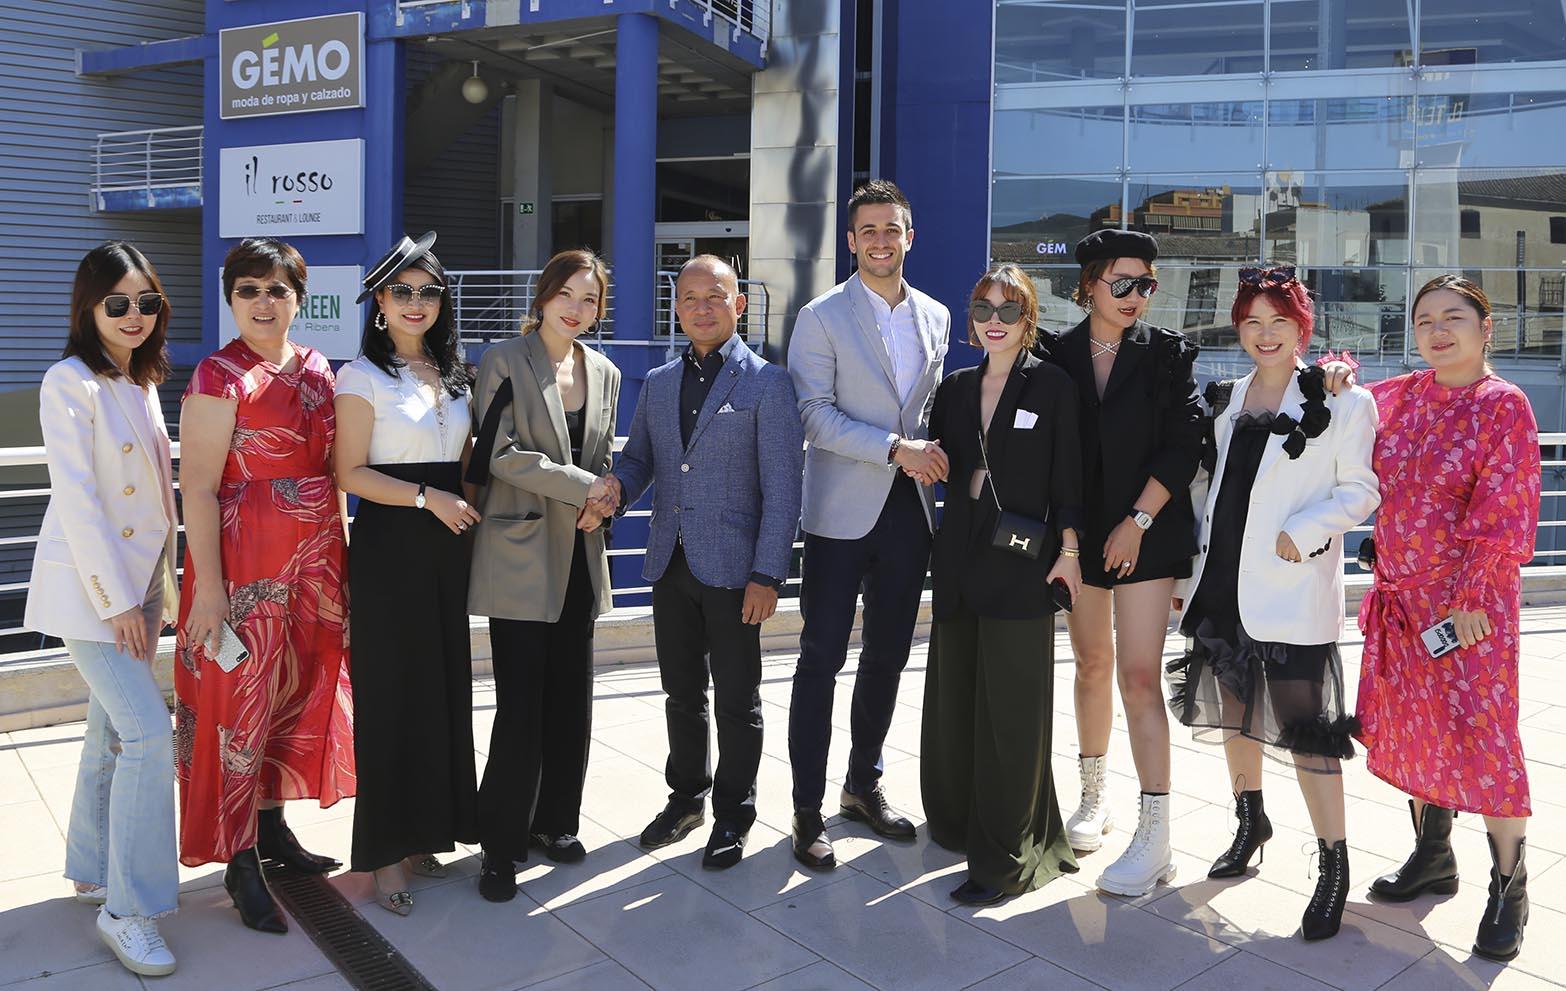 Un grupo cosmético chino elige a Ontinyent para su expansión El Periòdic d'Ontinyent